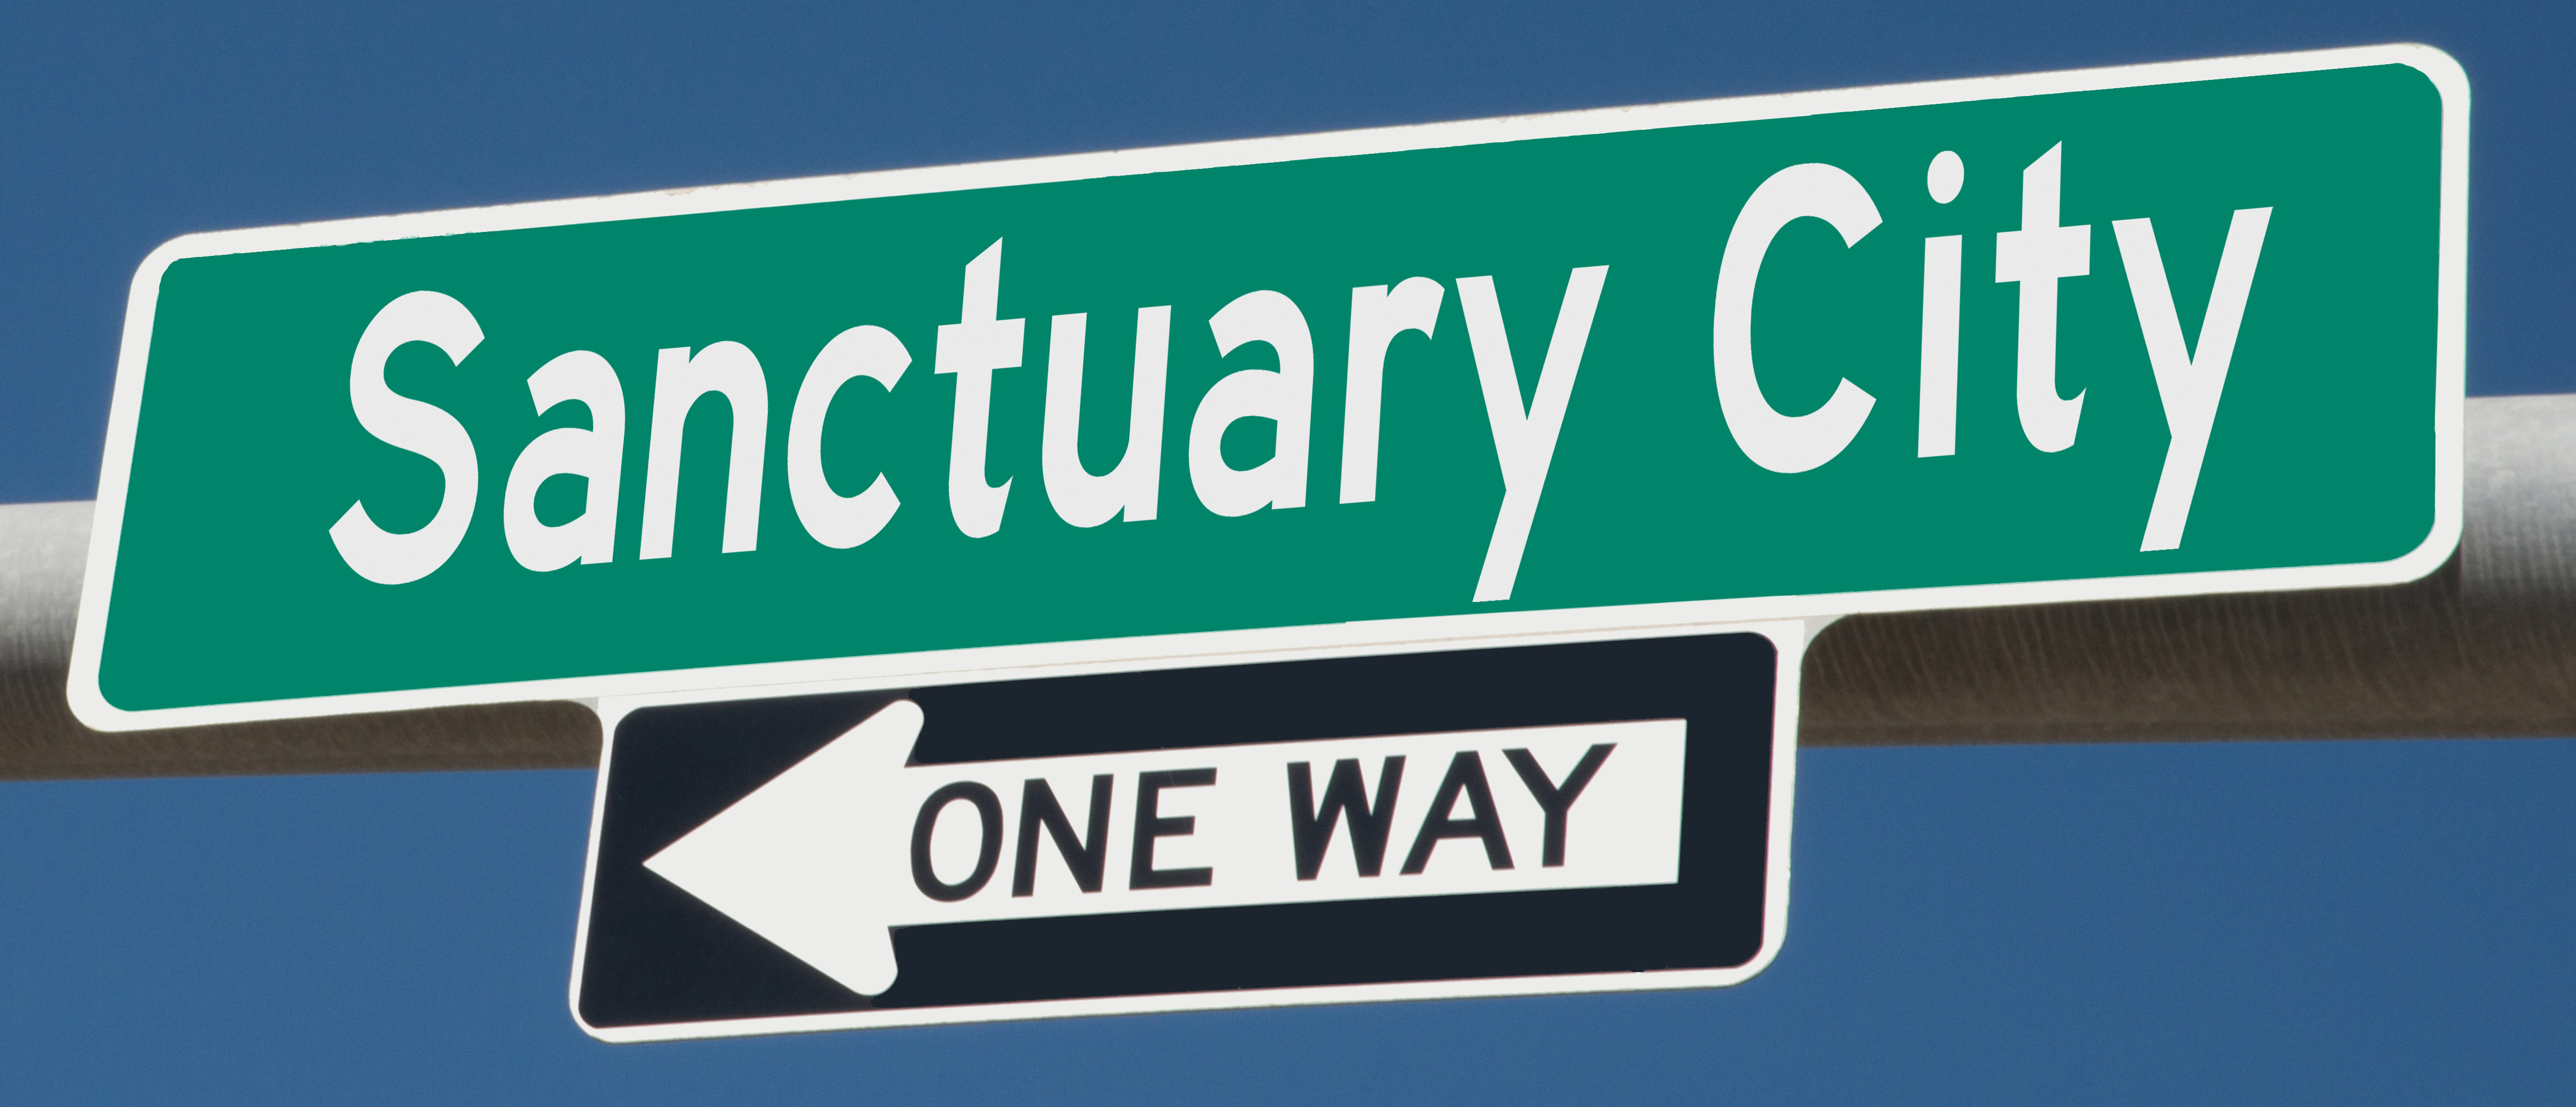 Sanctuary City sign (Shutterstock/Rex Wholster)